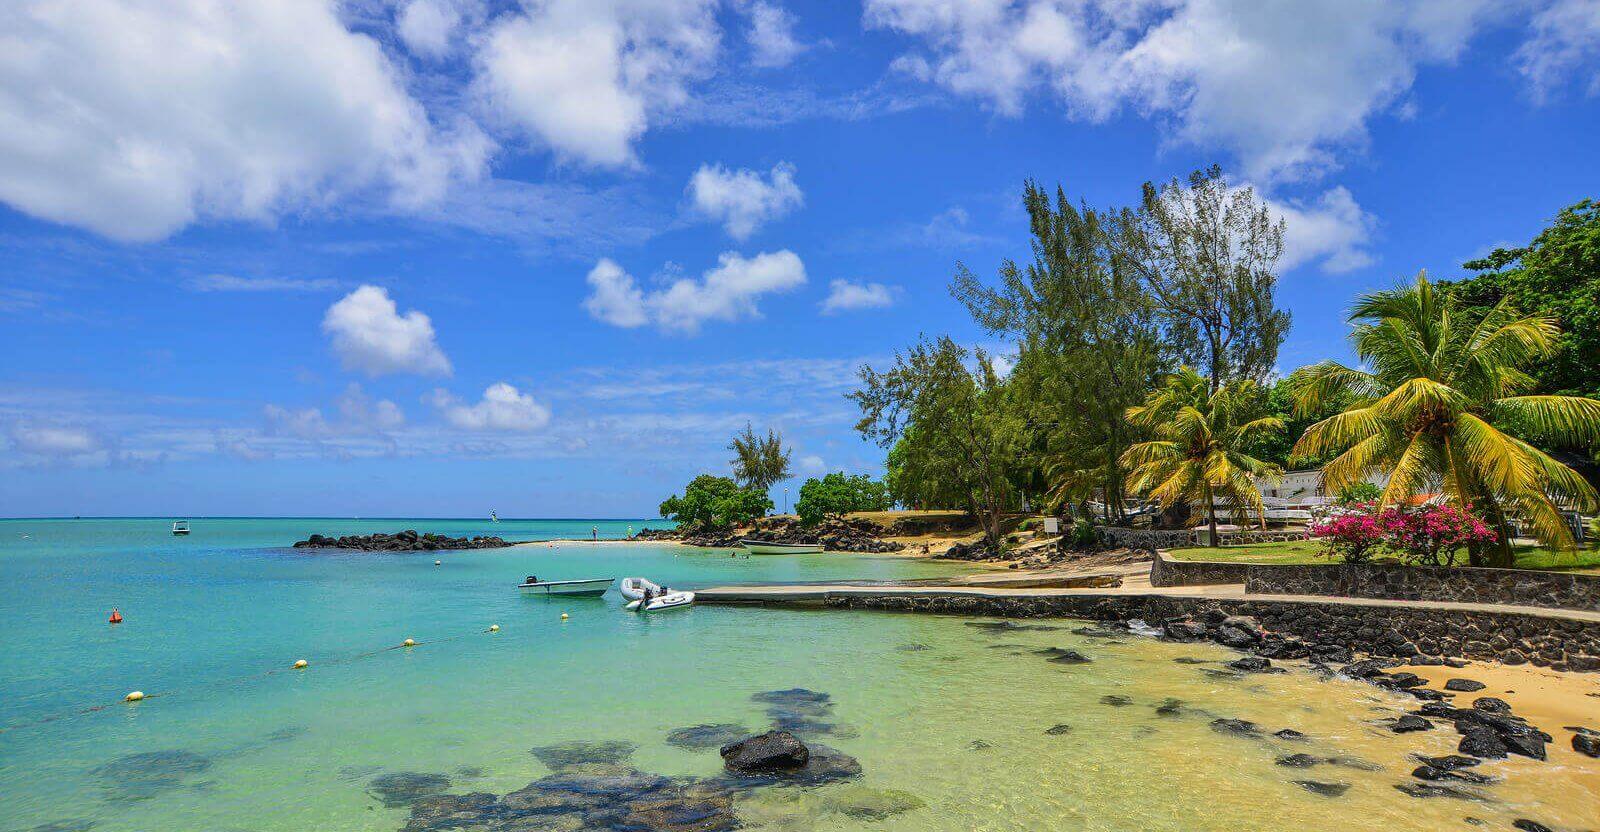 Seascape of Grand Baie, Mauritius.